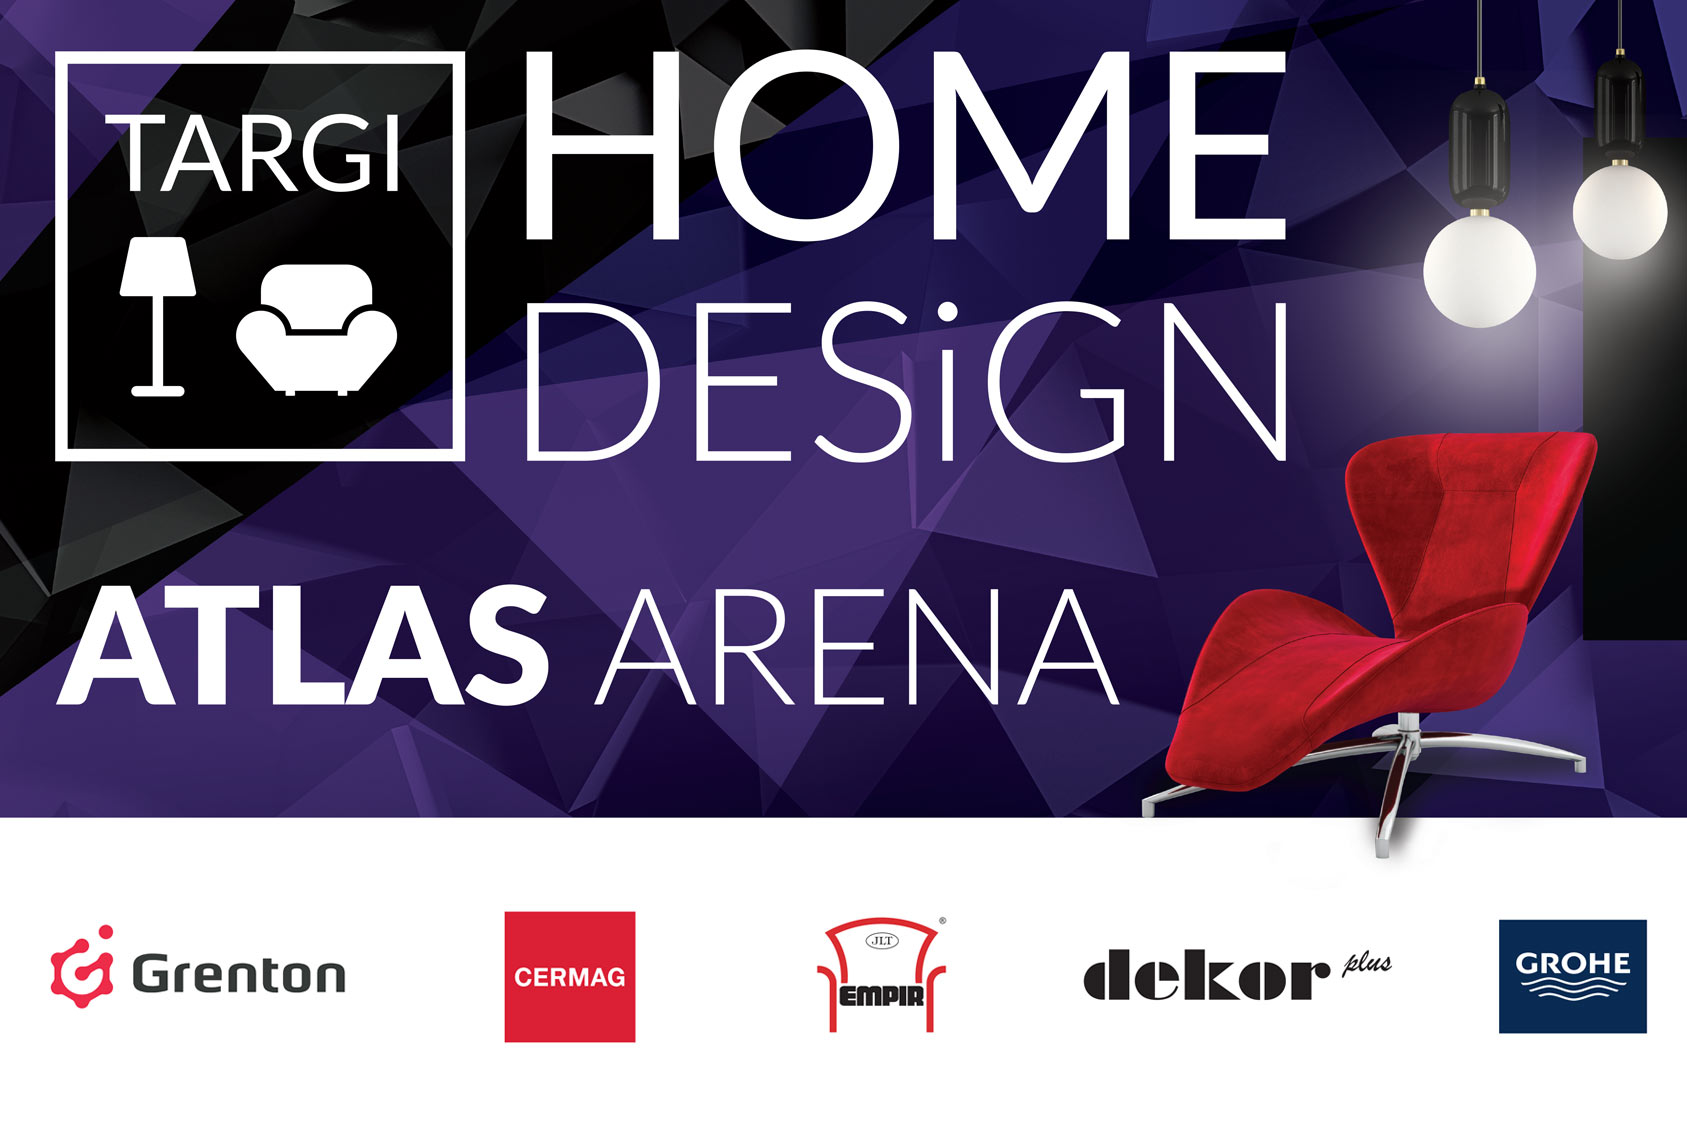 Targi Home Design